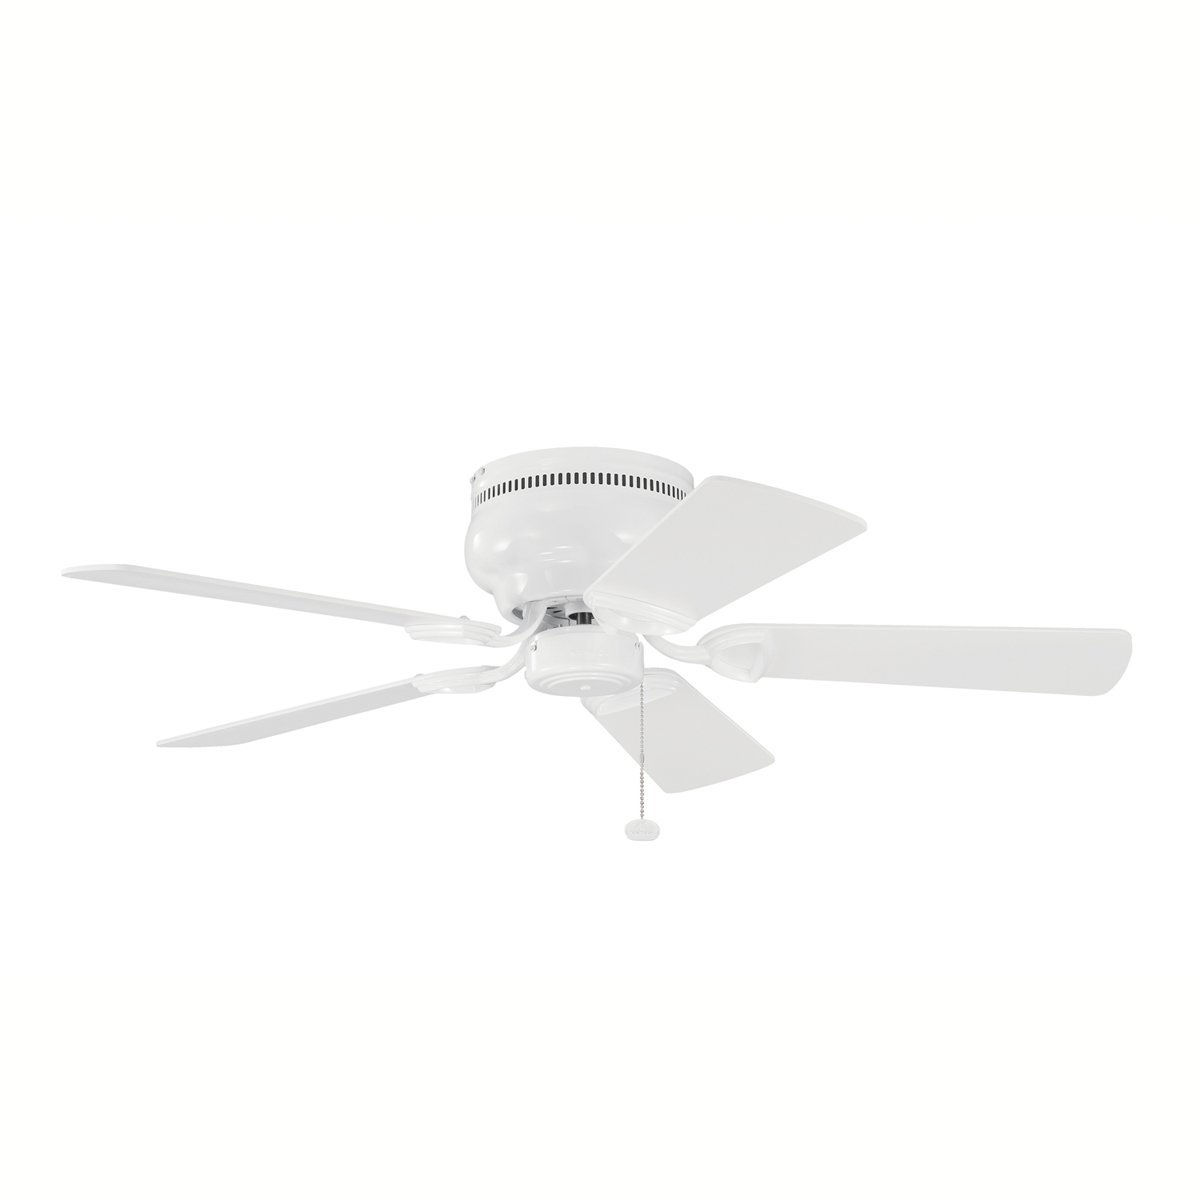 "Kichler 339017WH, Stratmoor, Ceiling Fan, 42"" Span, White"